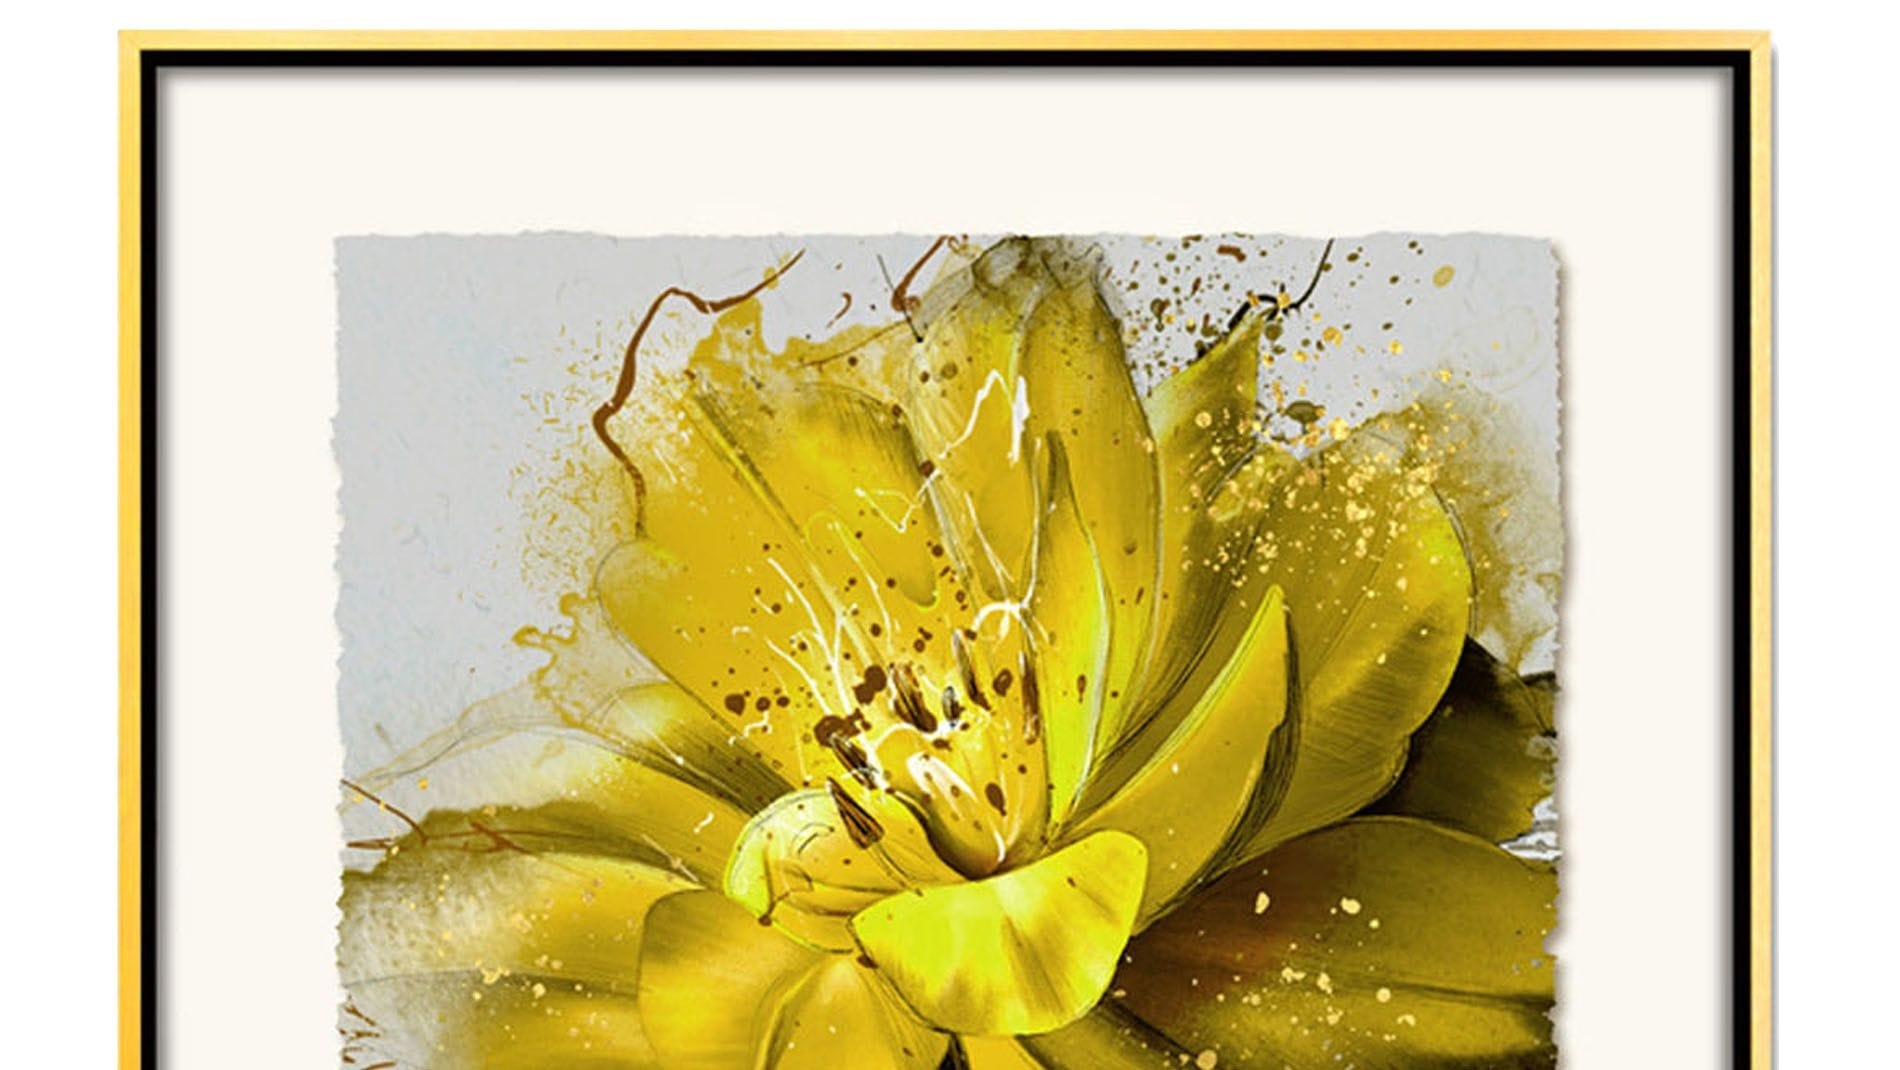 Постер на стену красивый желтый цветок 80х80см